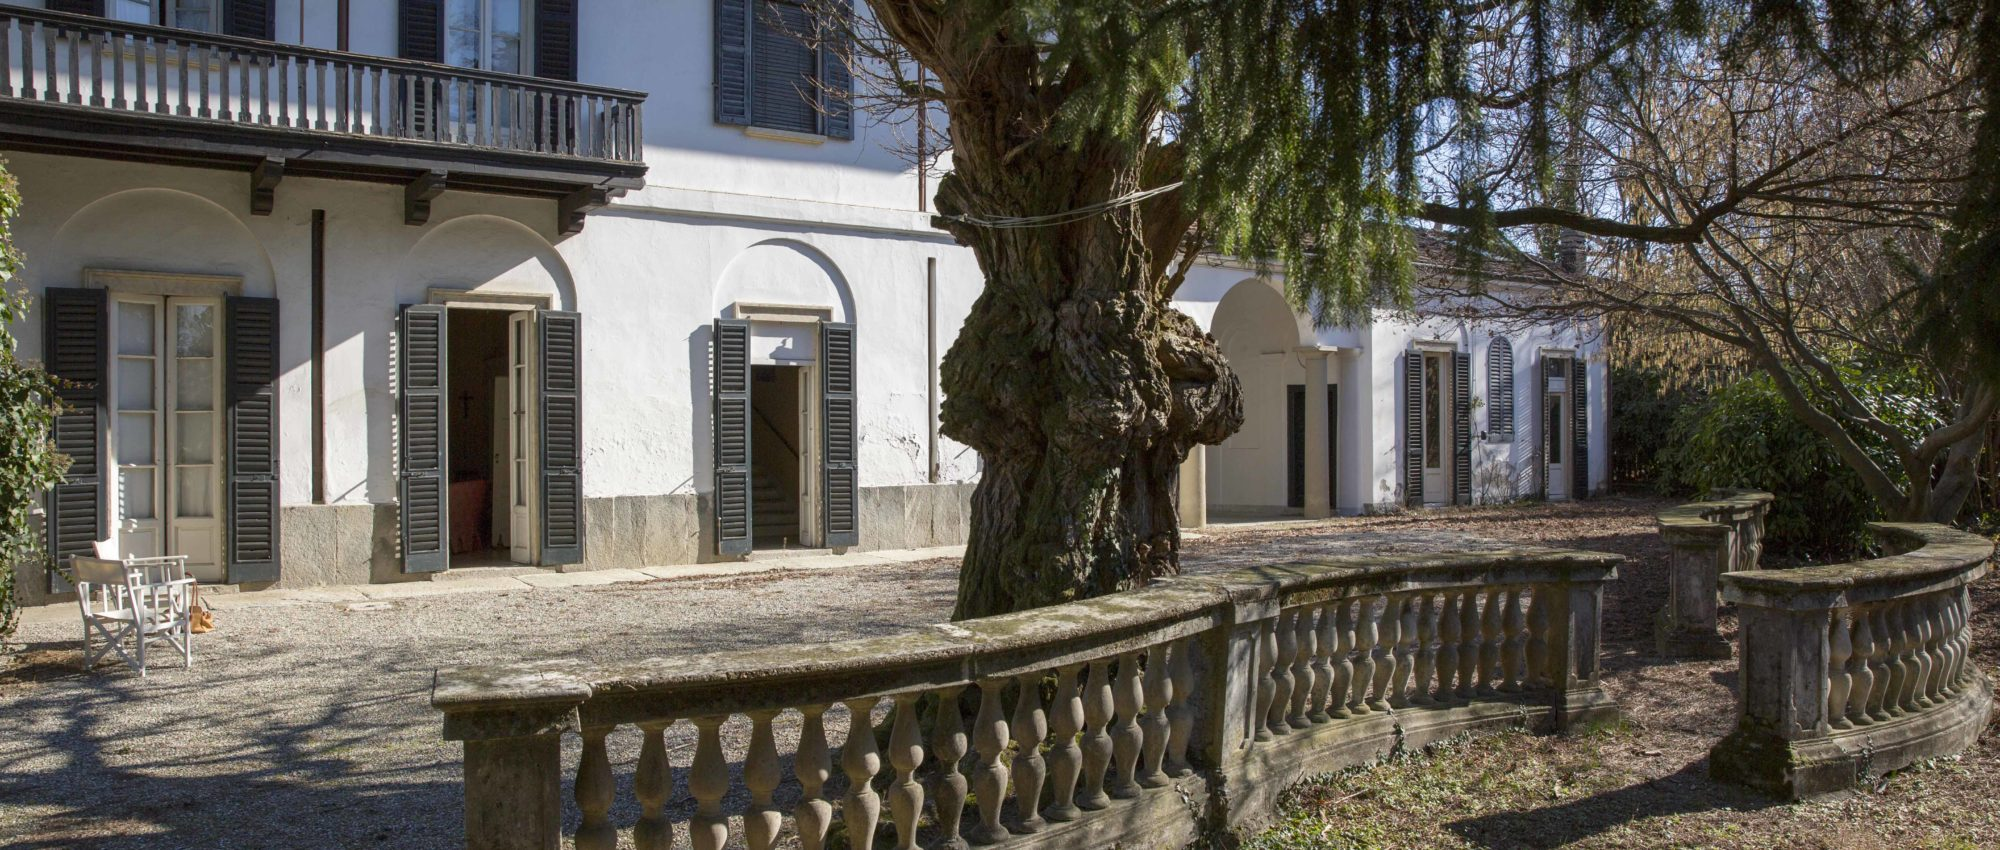 Dimora storica con giardino